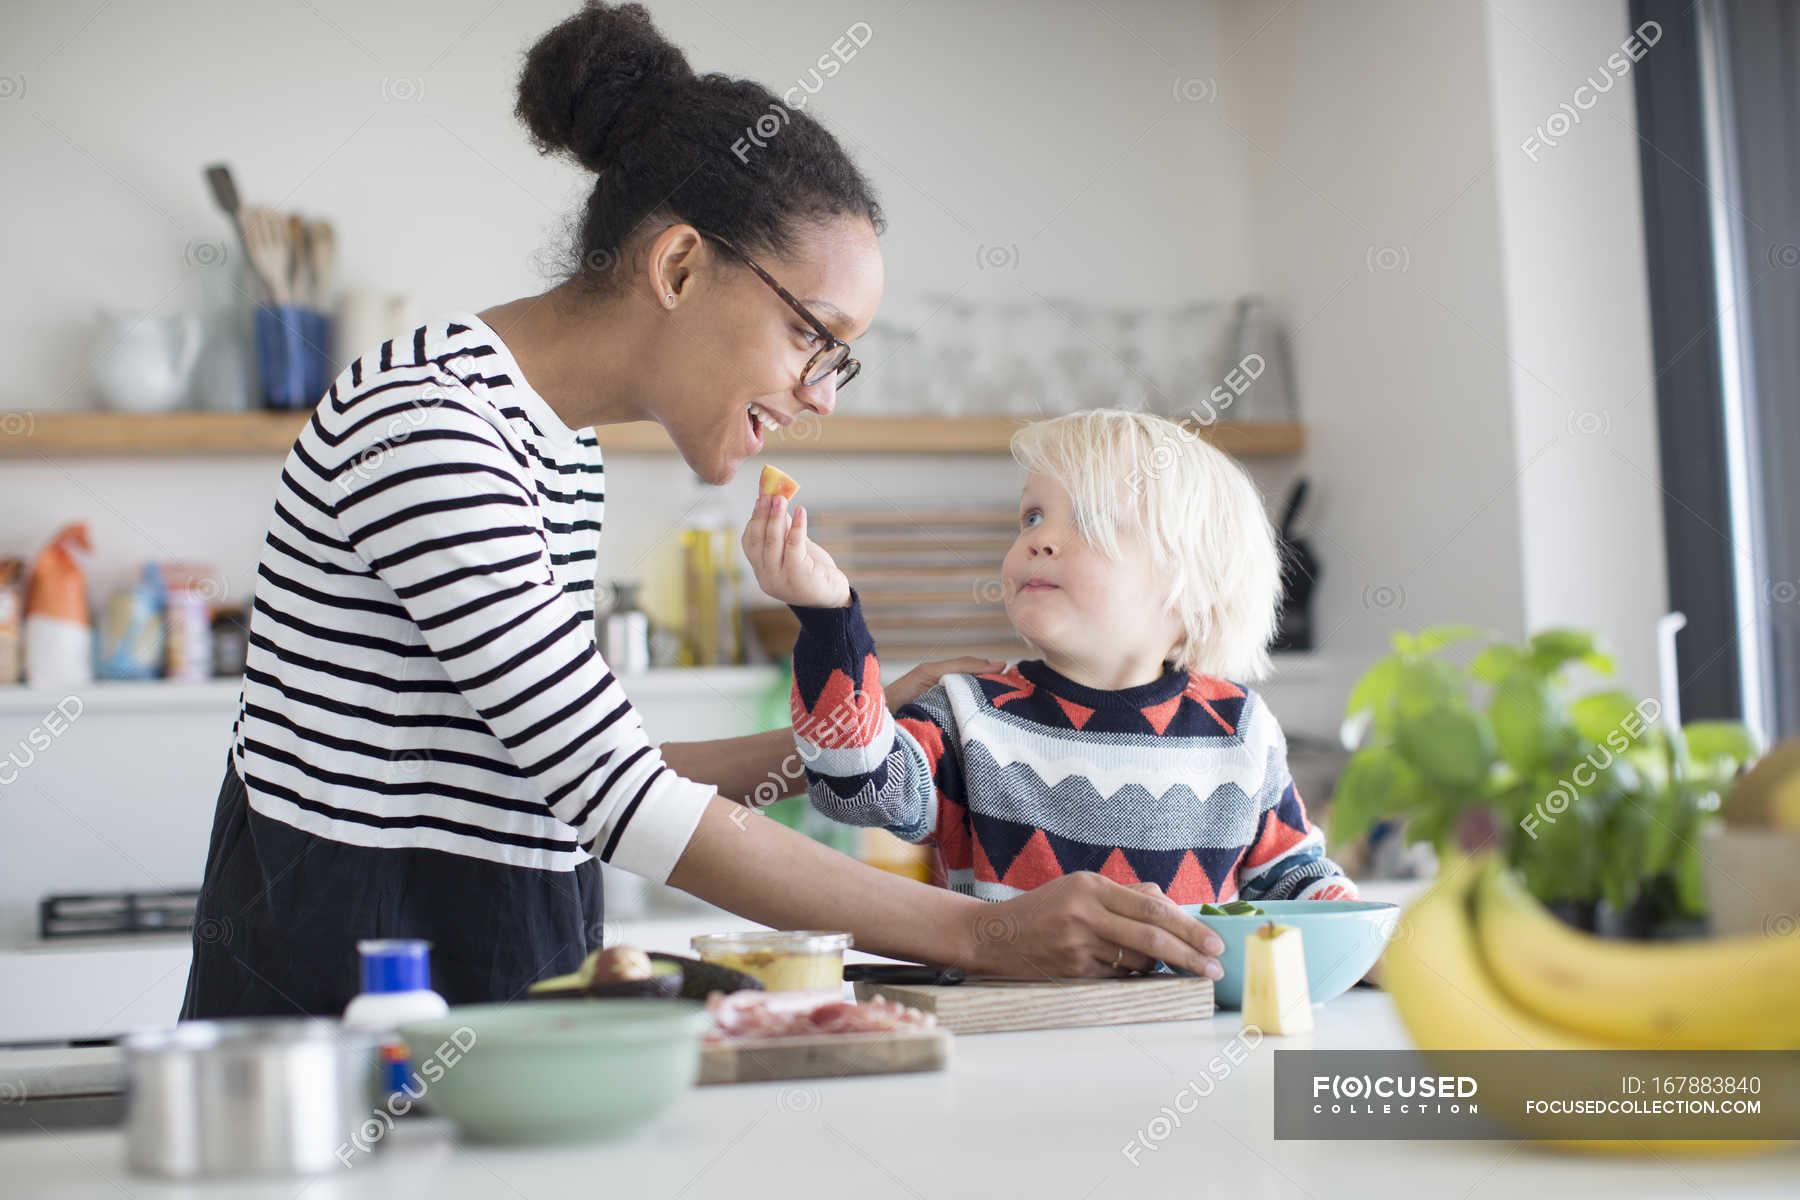 Сын трахнув маму в попу на кухни, Сын ебет маму в жопу на кухне - порно видео онлайн 9 фотография